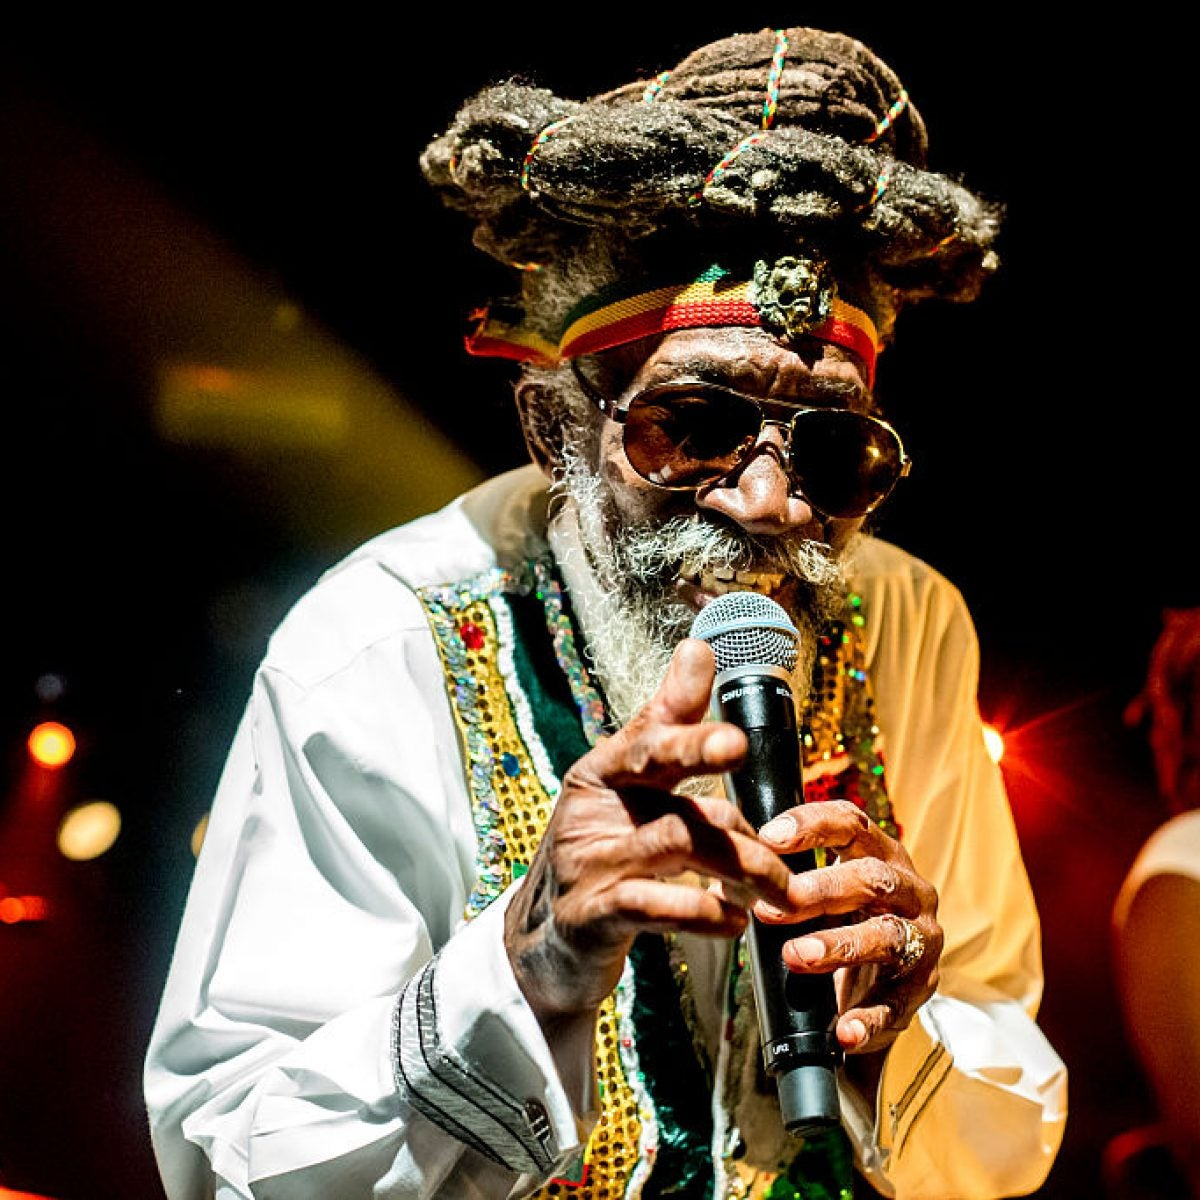 Reggae Legend Bunny Wailer Has Died At 73